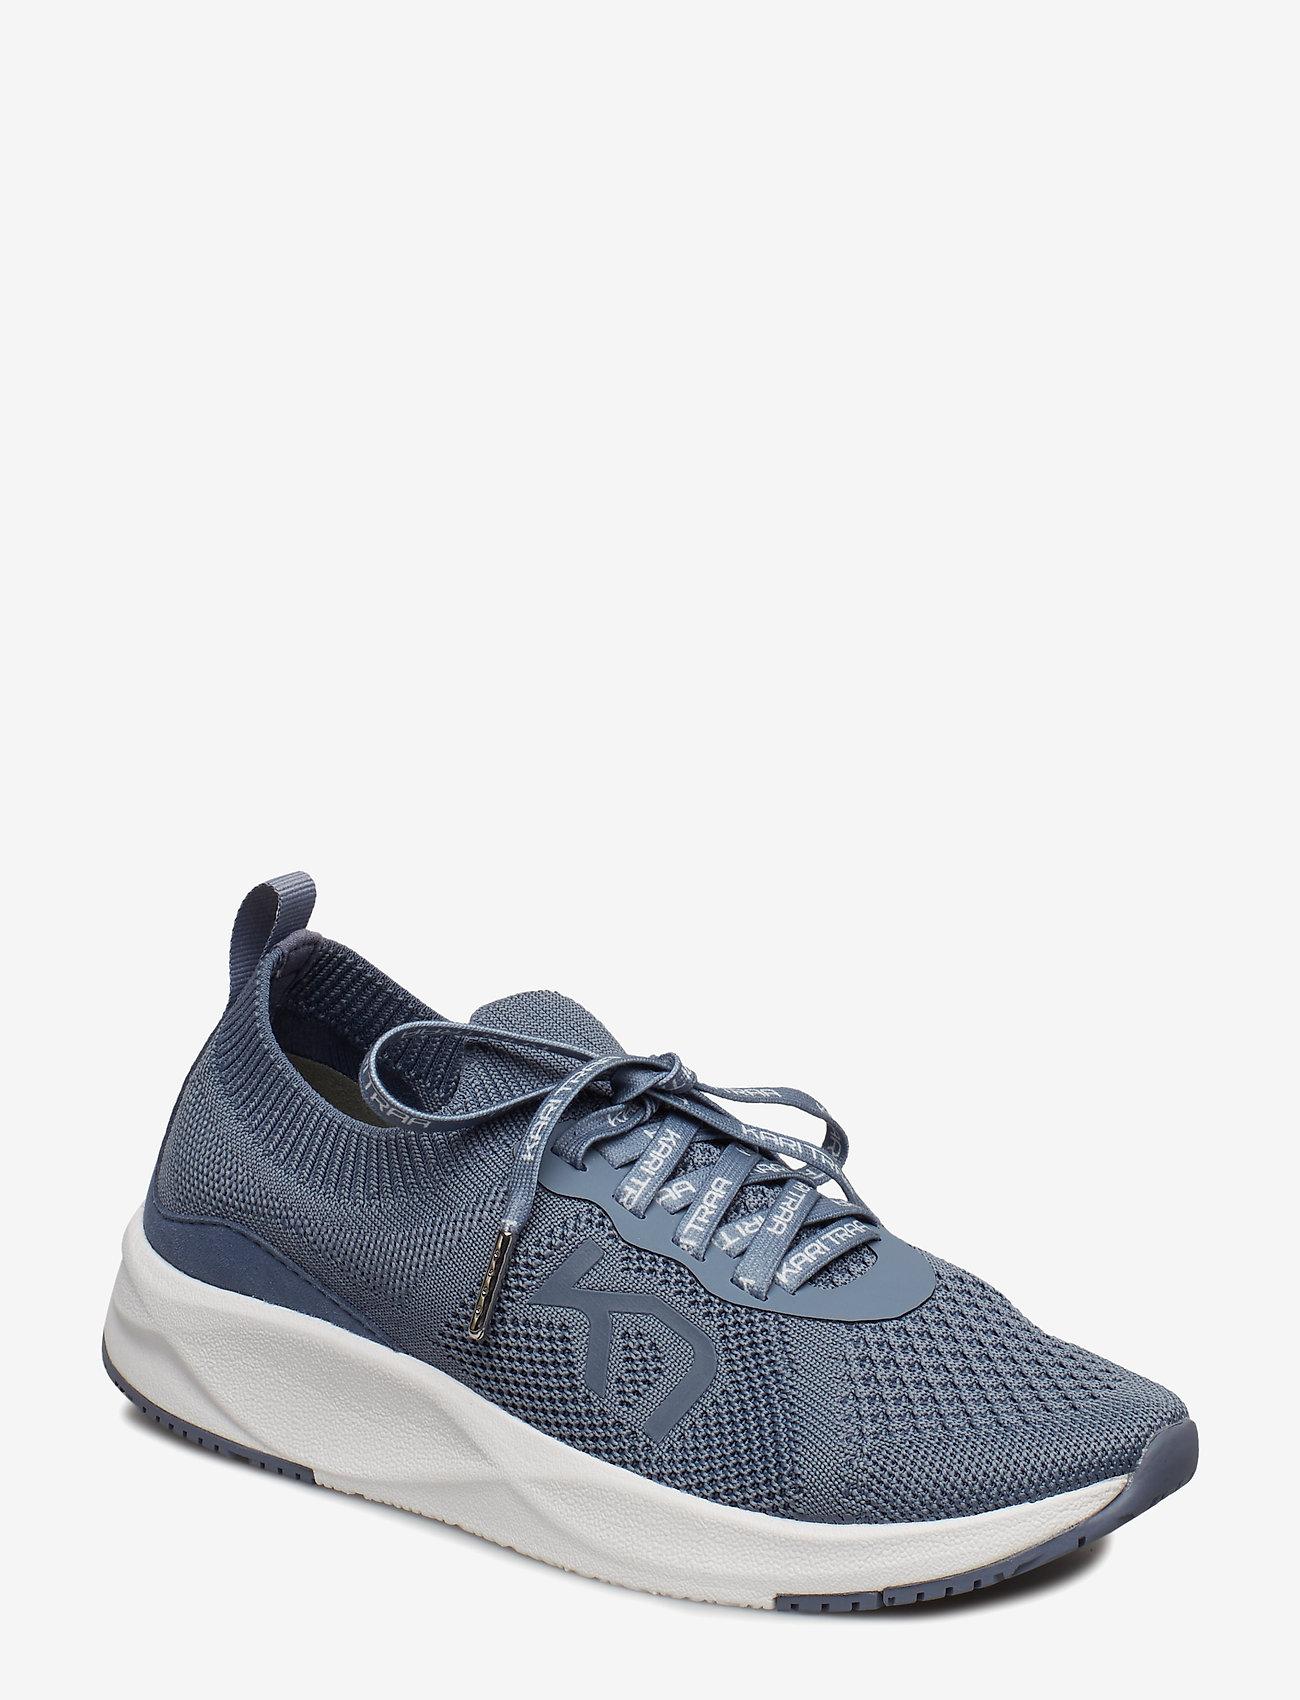 Kari Traa - BYKS - låga sneakers - jeans - 0